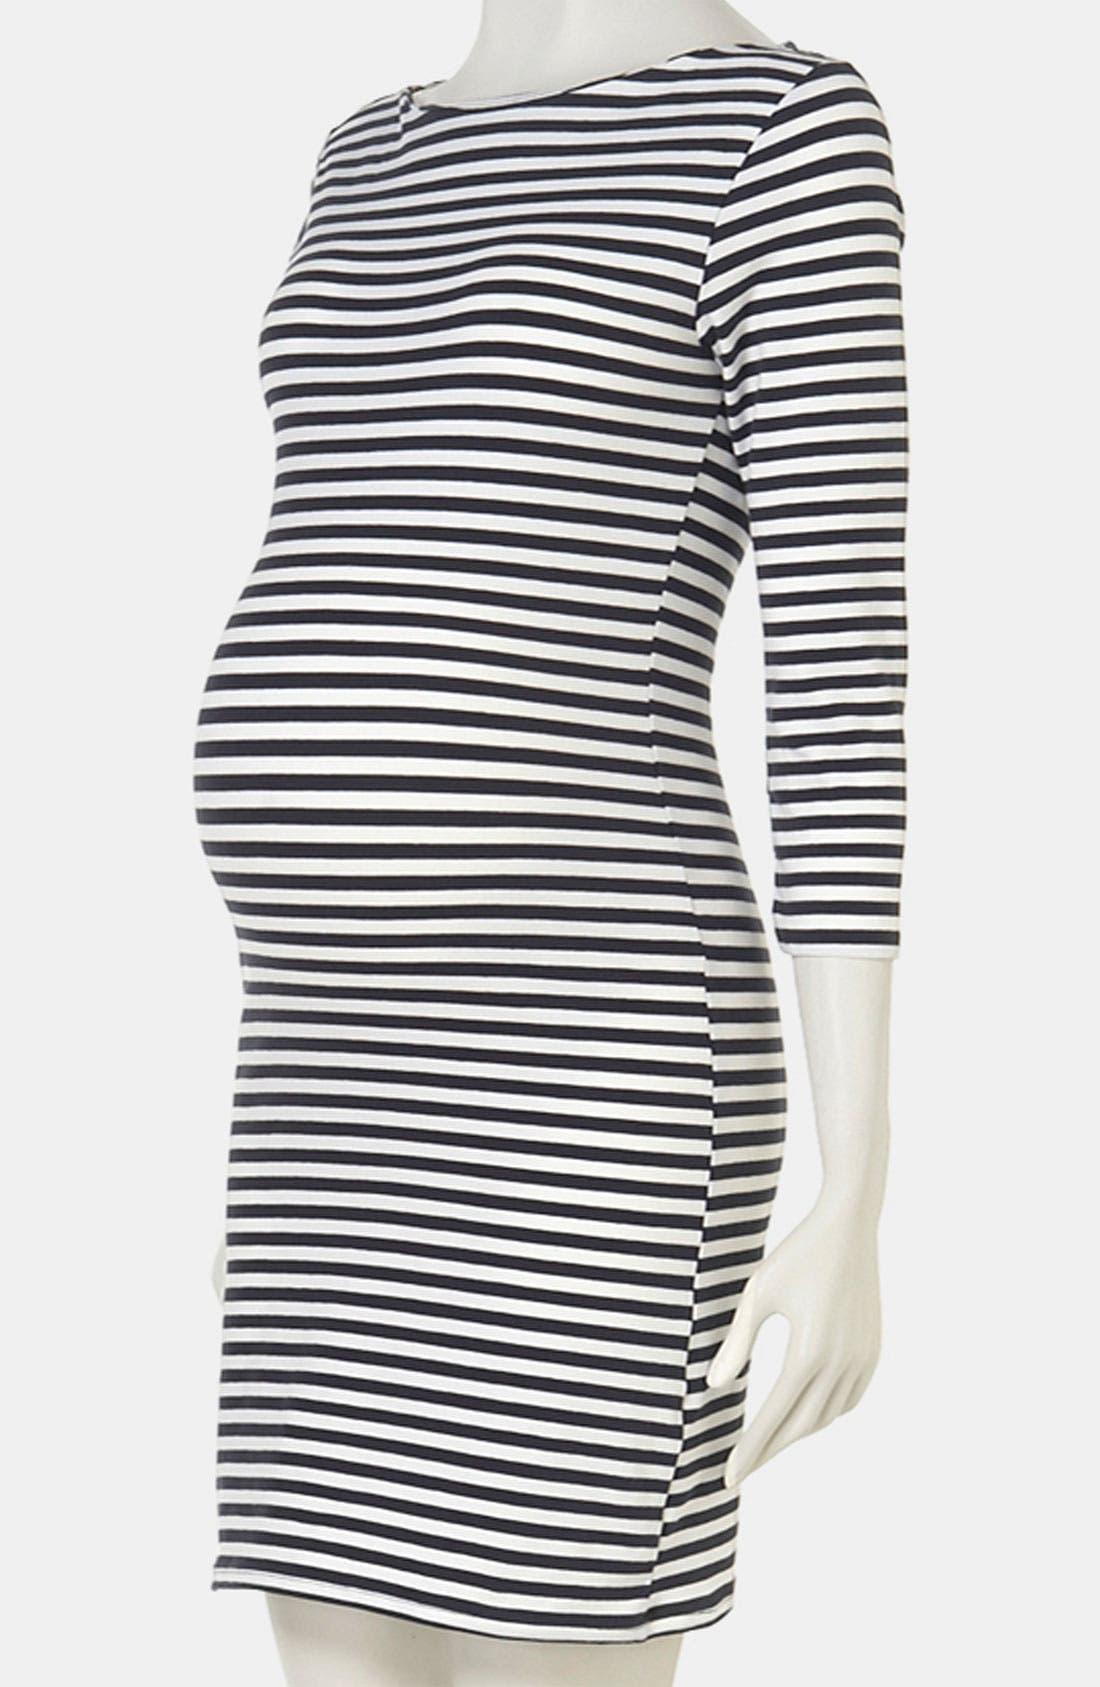 Main Image - Topshop Stripe Maternity Dress